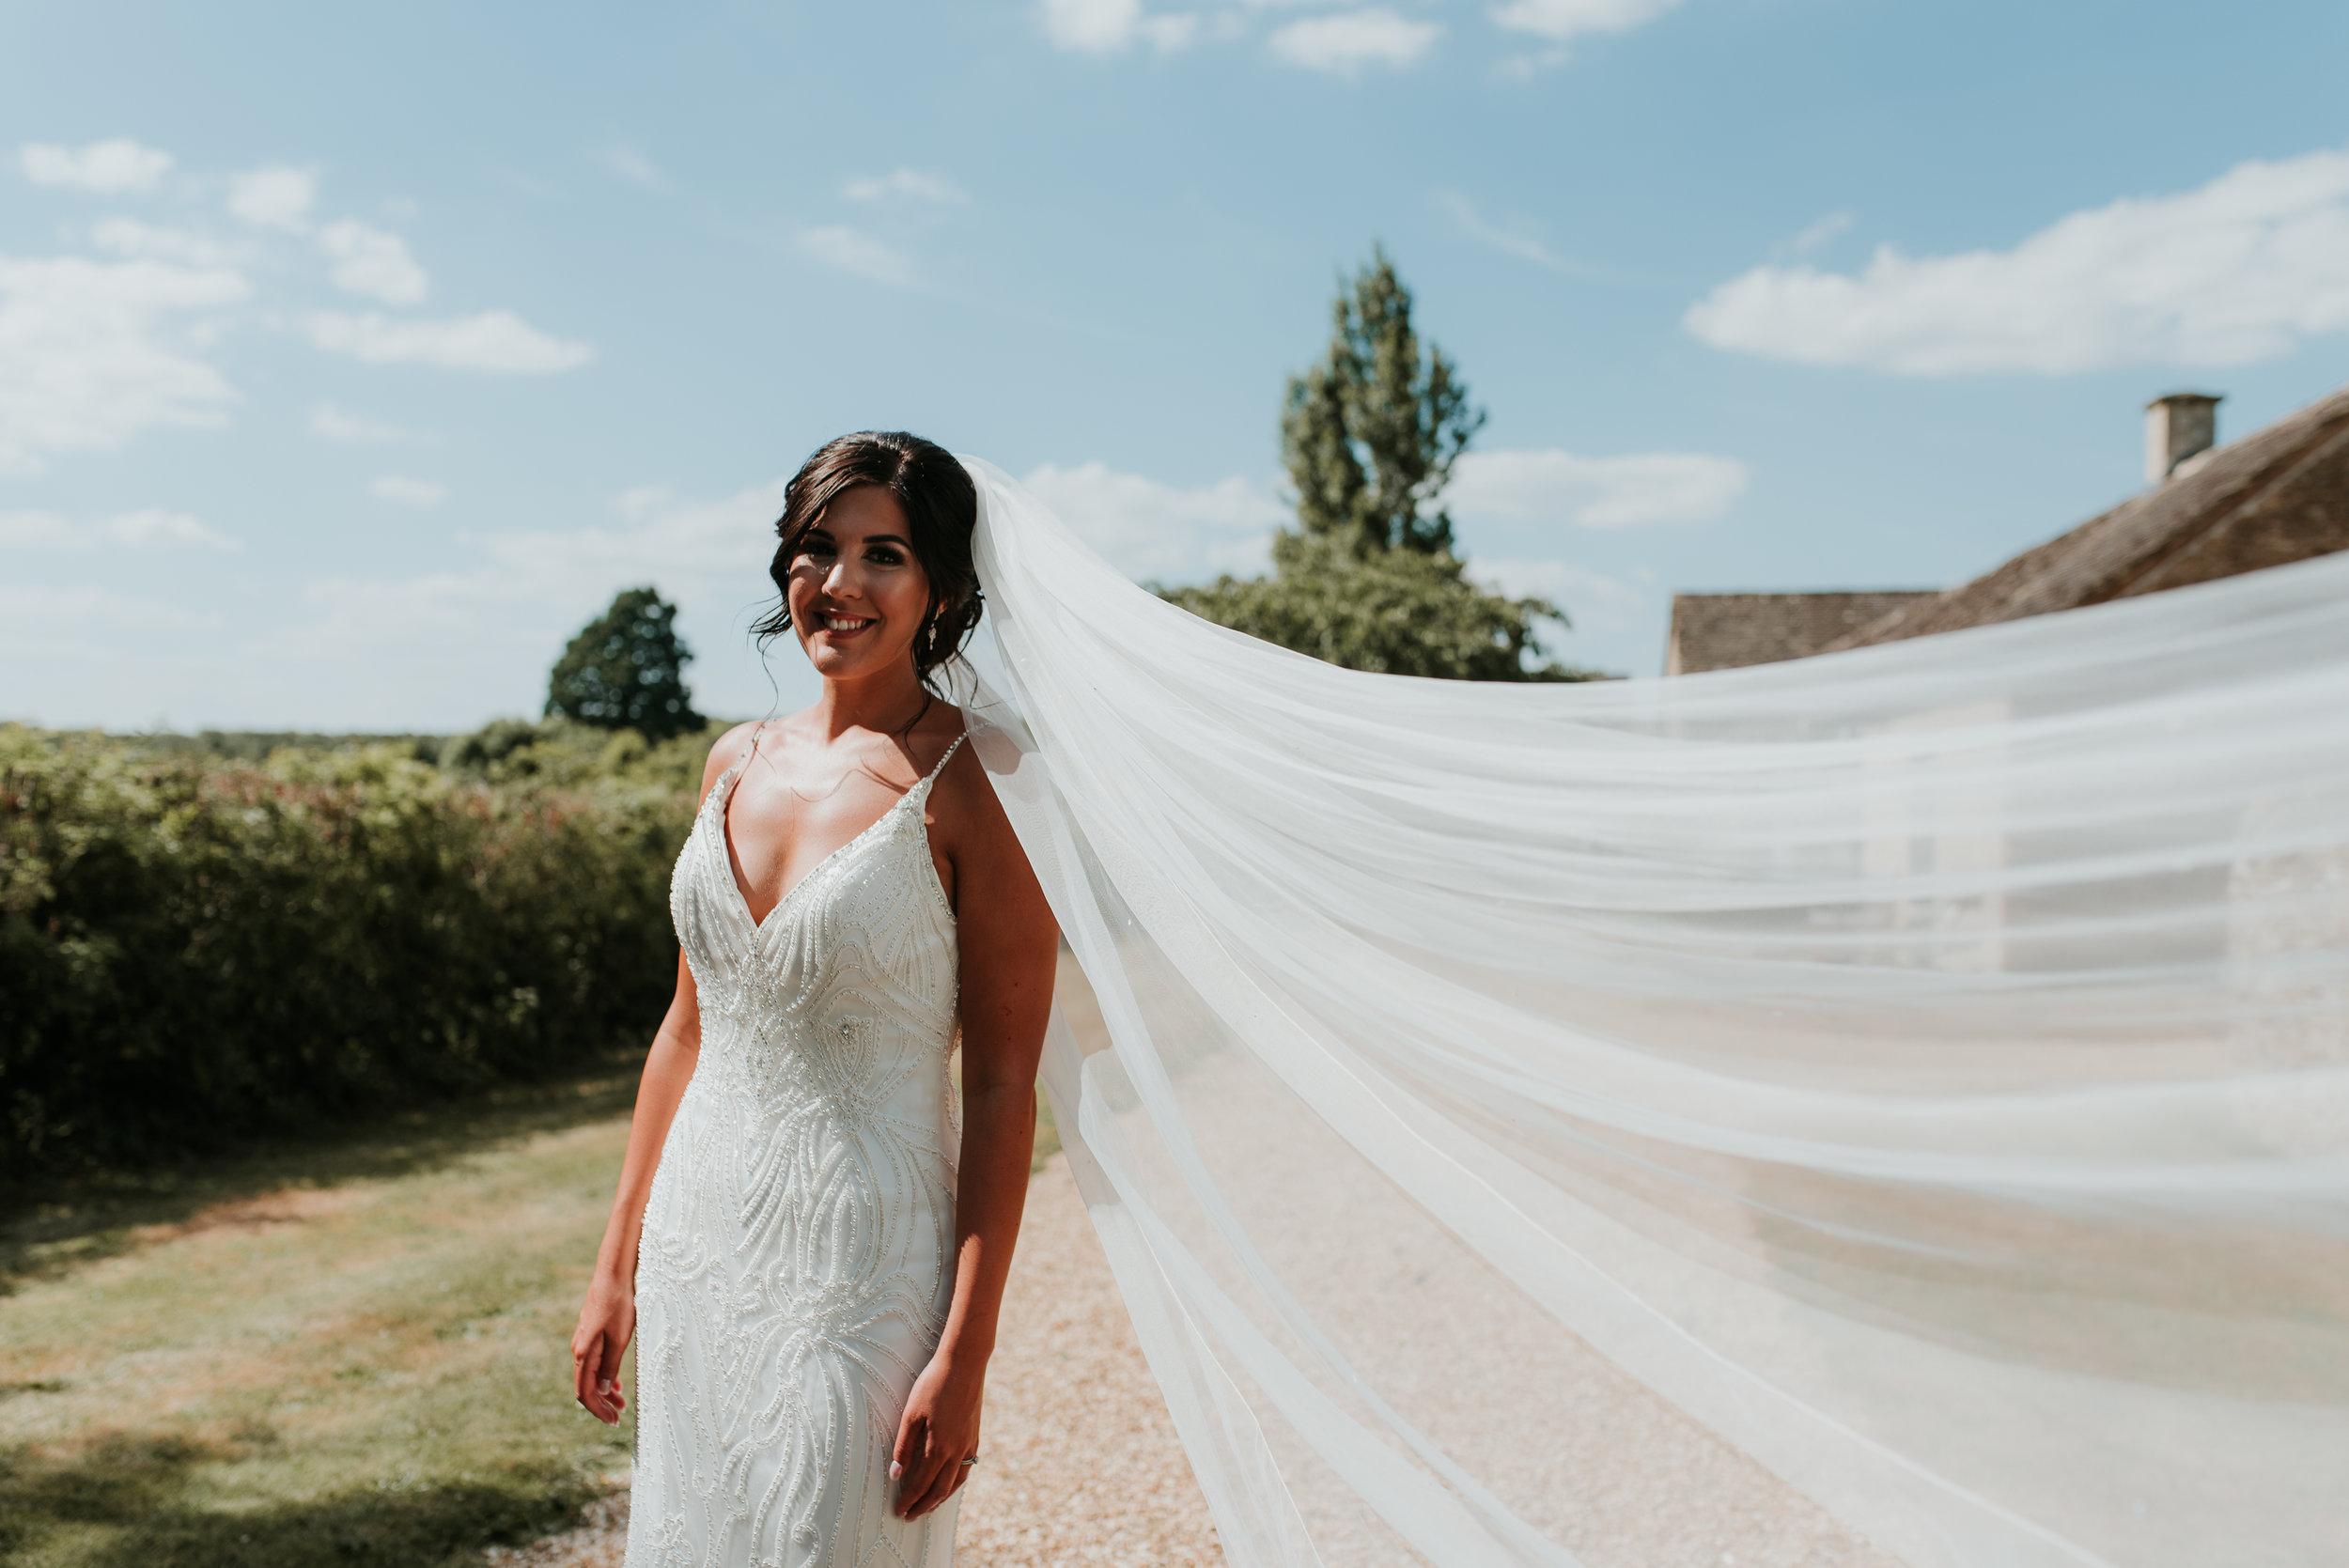 wedding photographer Merriscourt